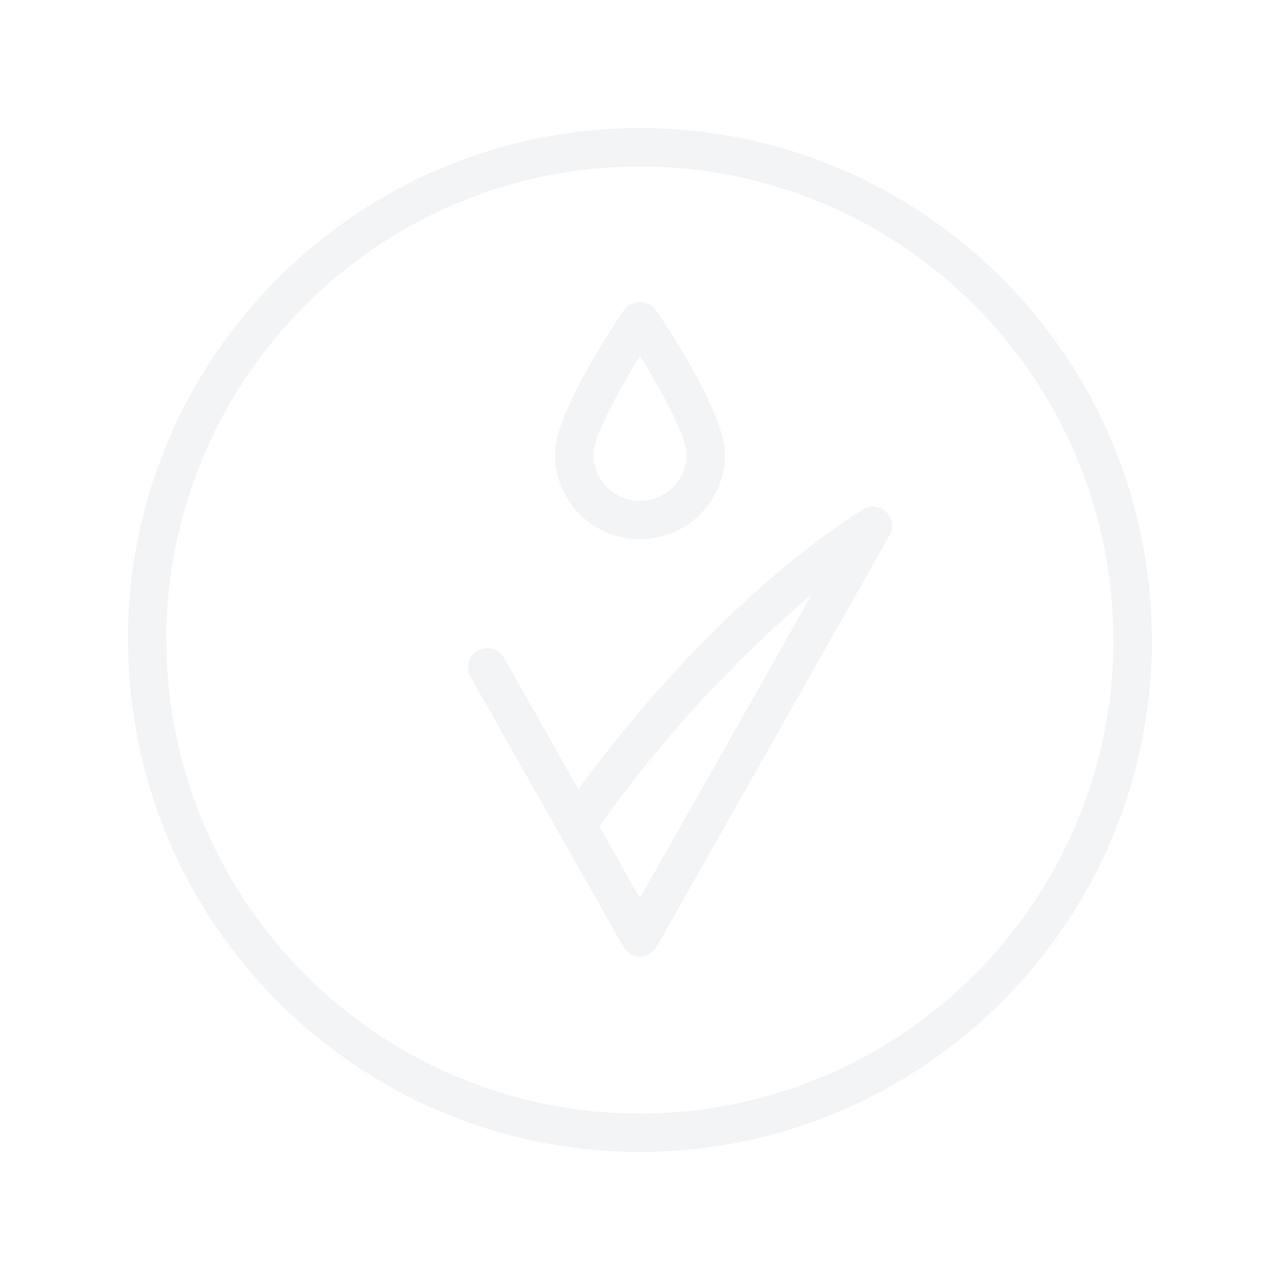 IDUN Minerals Highlighter Eyeshadow 3g